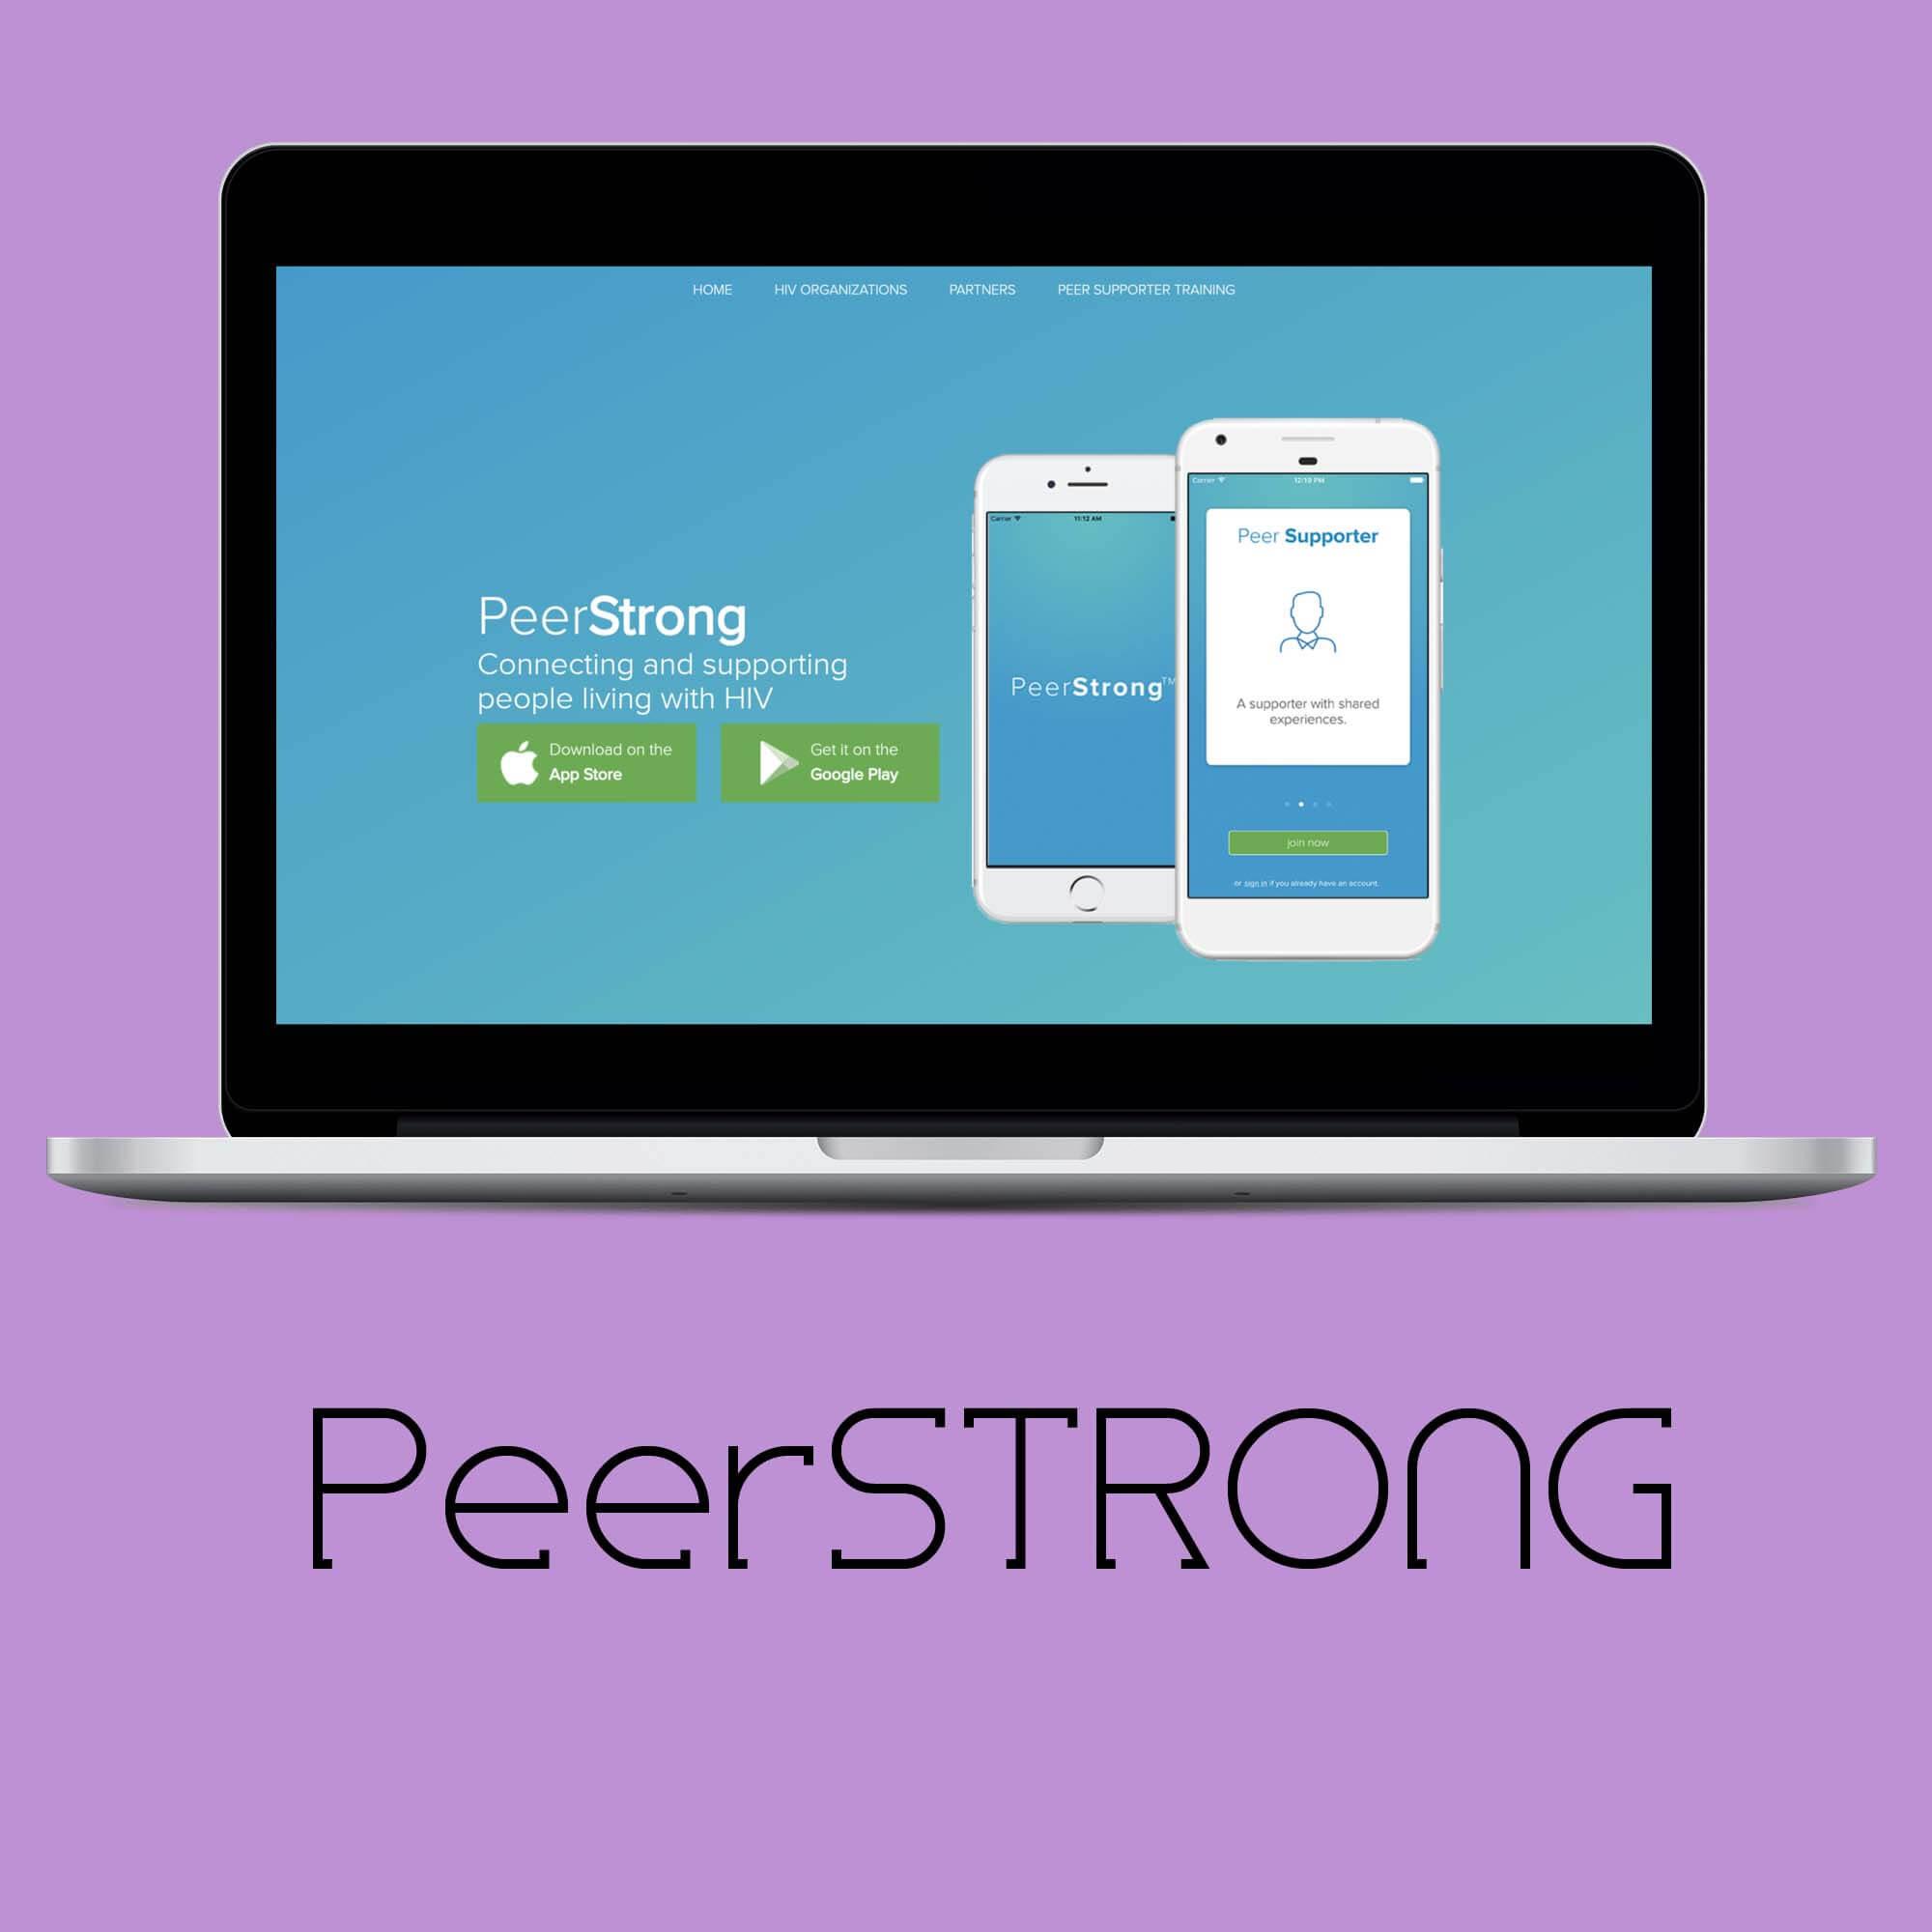 www.peerstrong